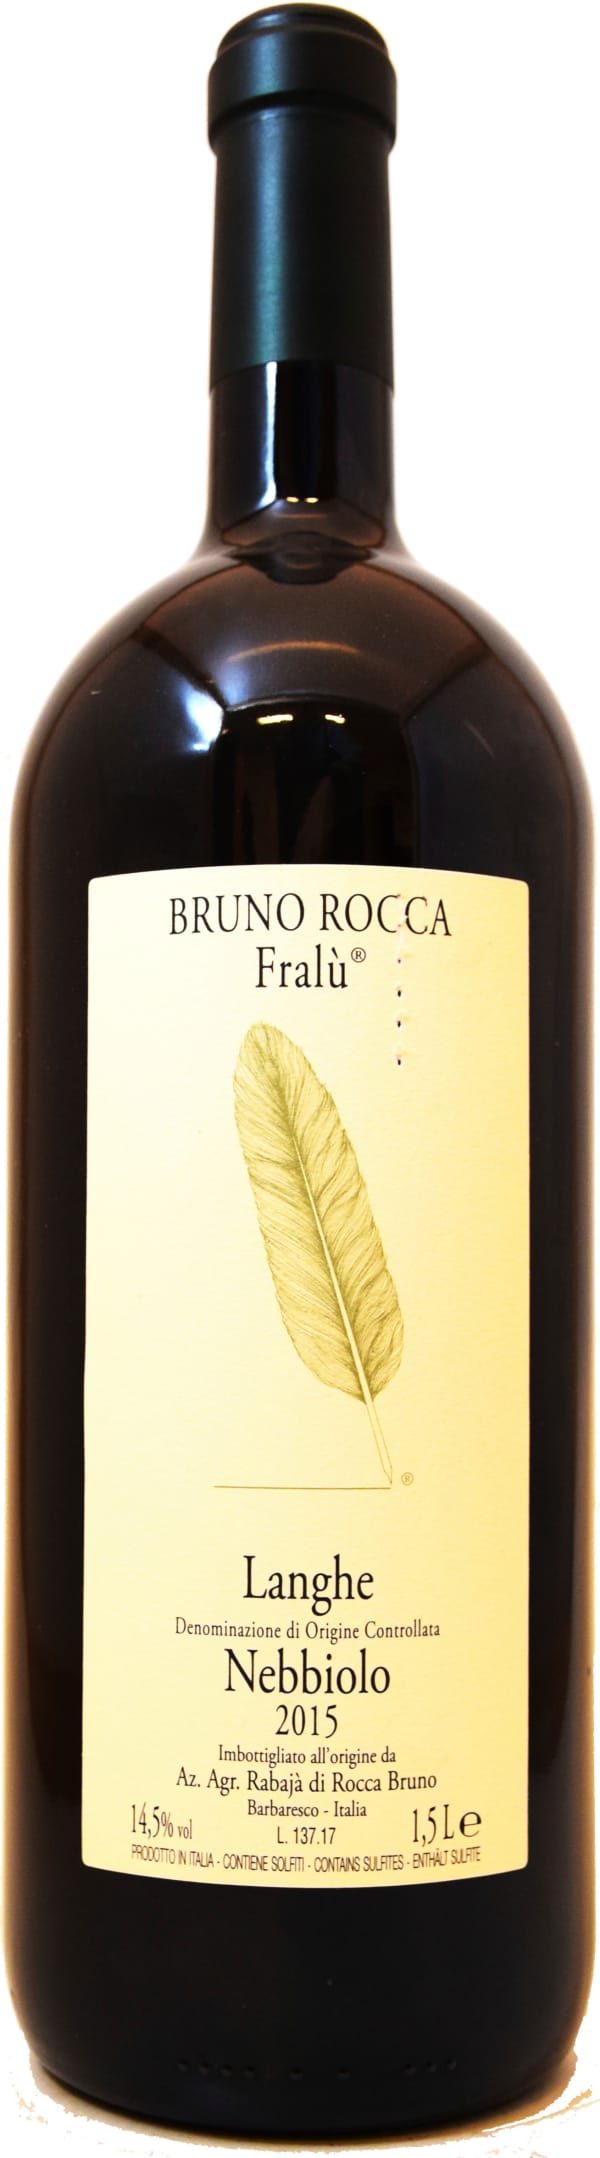 Bruno Rocca Fralu Nebbiolo Magnum 2015